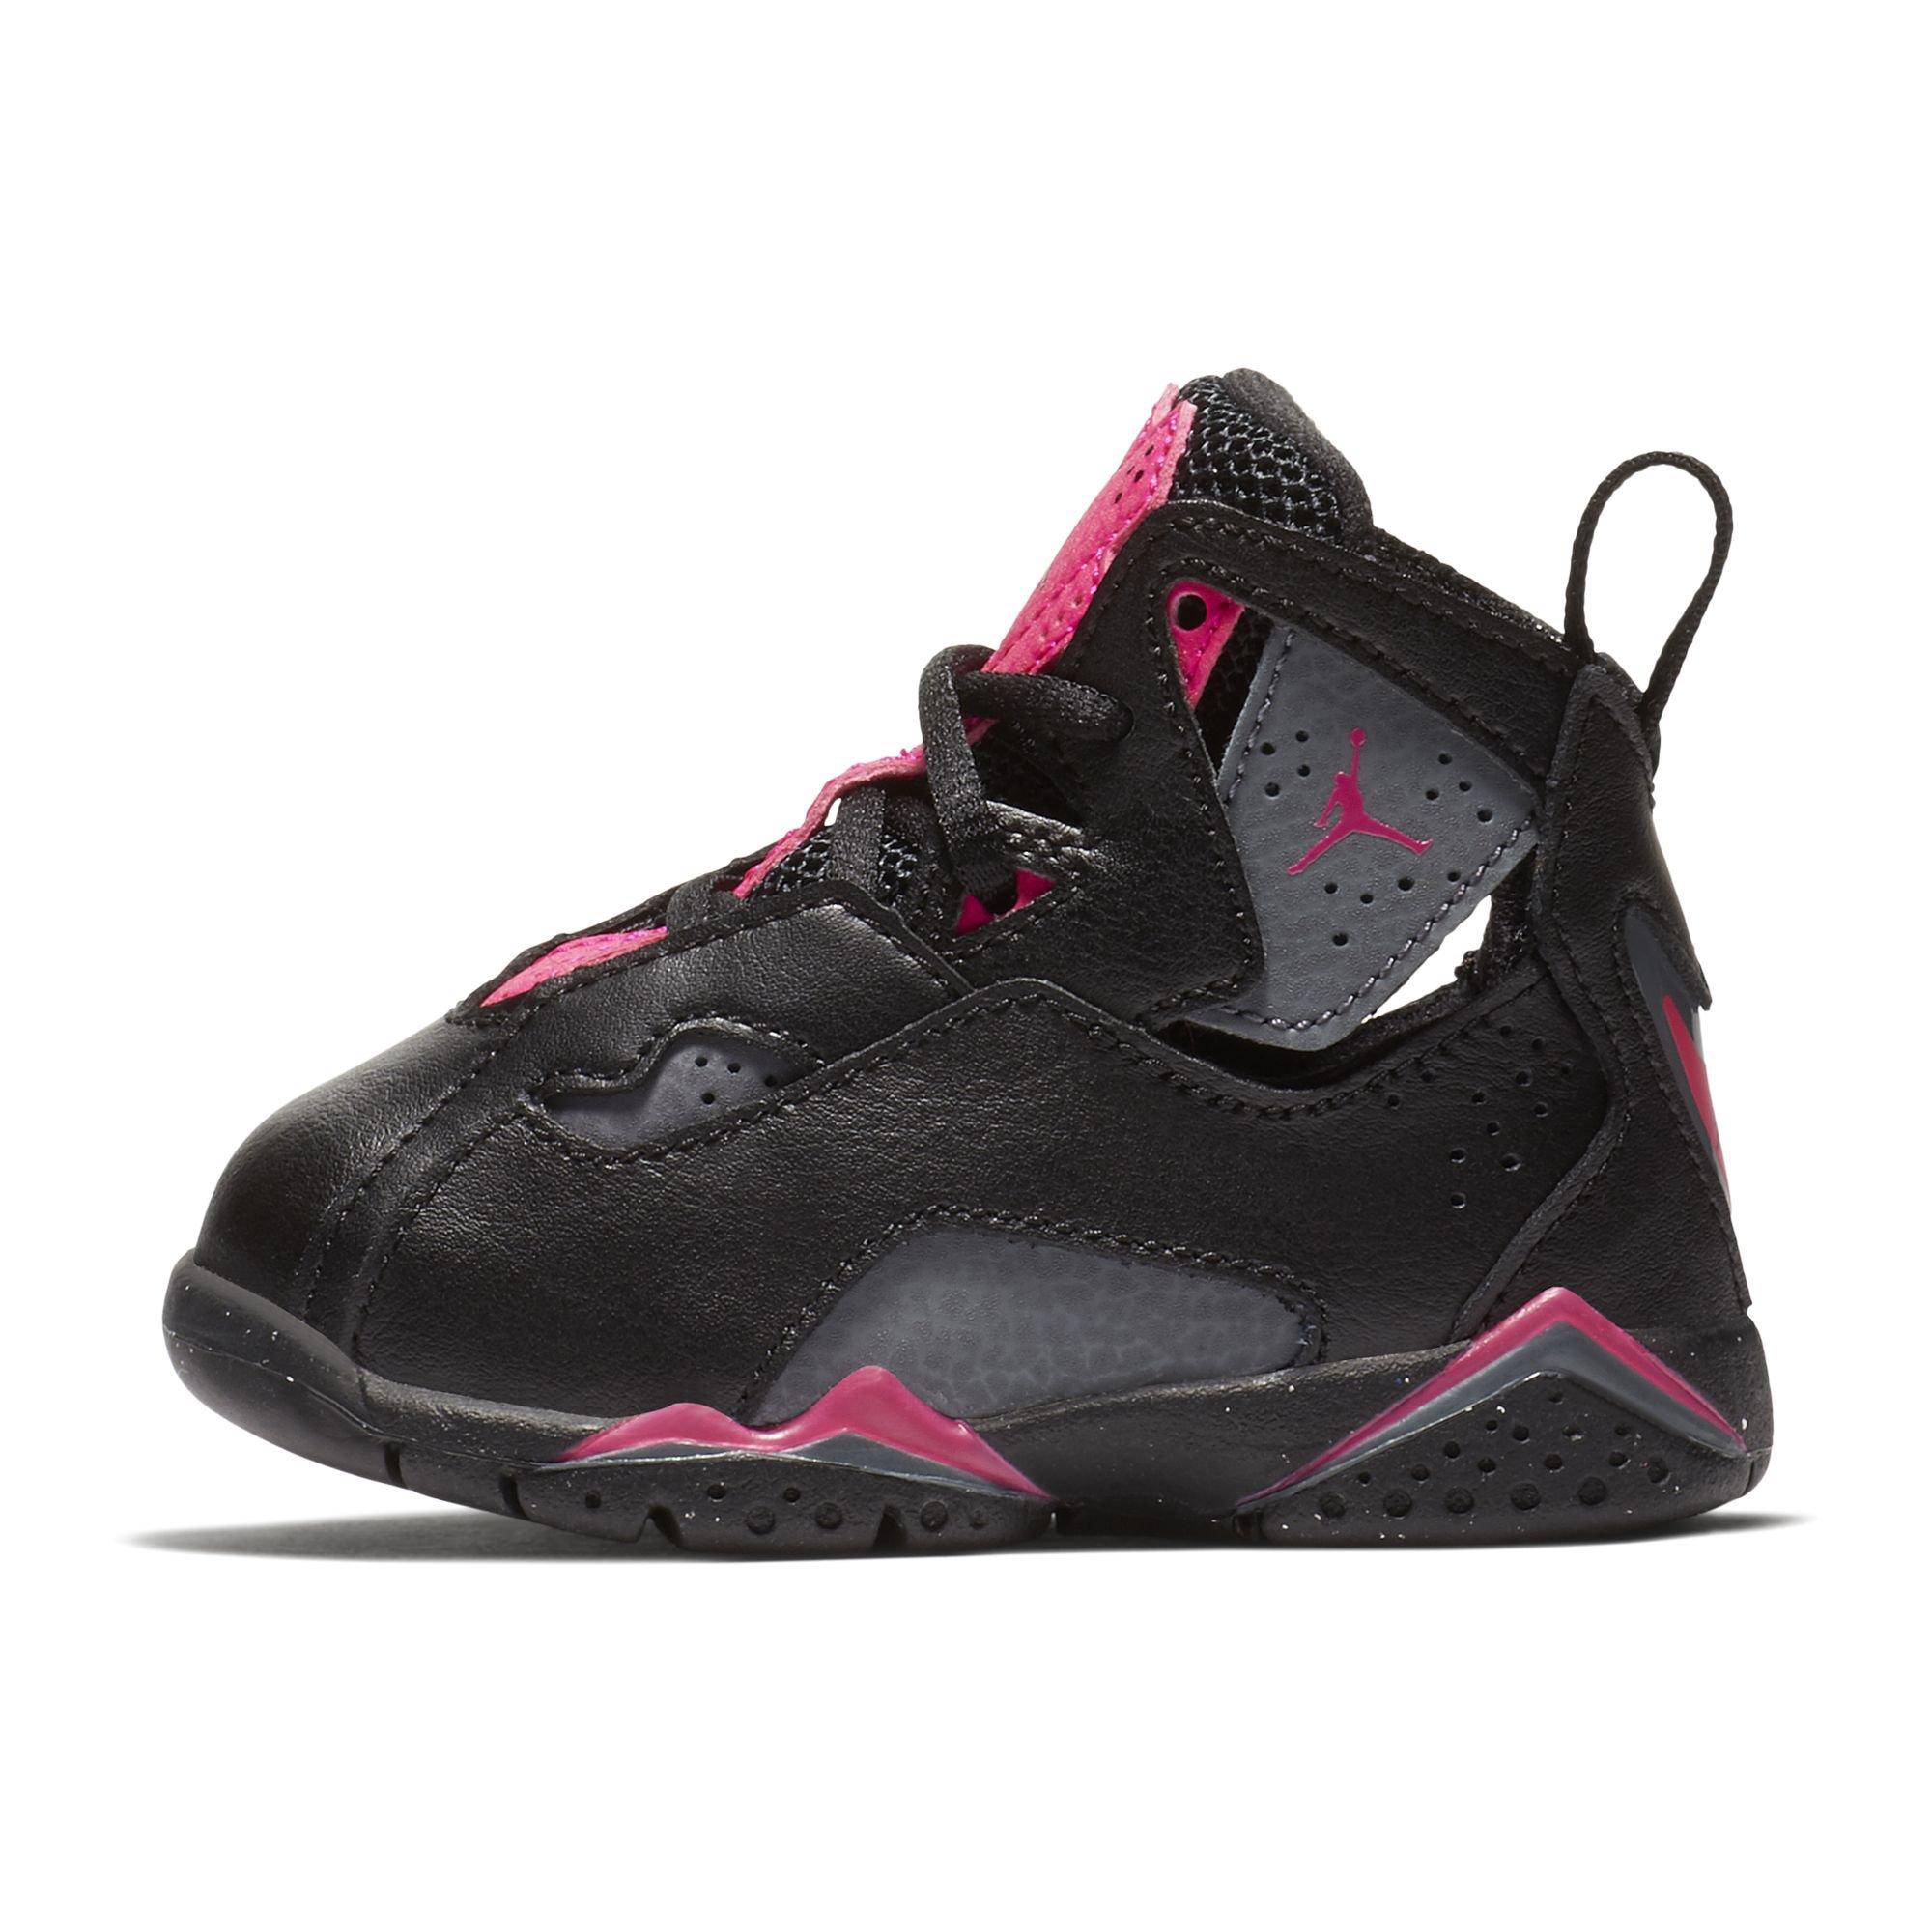 Jordan Nike Toddlers True Flight GT Black/Dark/Grey/Deadly/Pink Basketball Shoe 5 Infants US